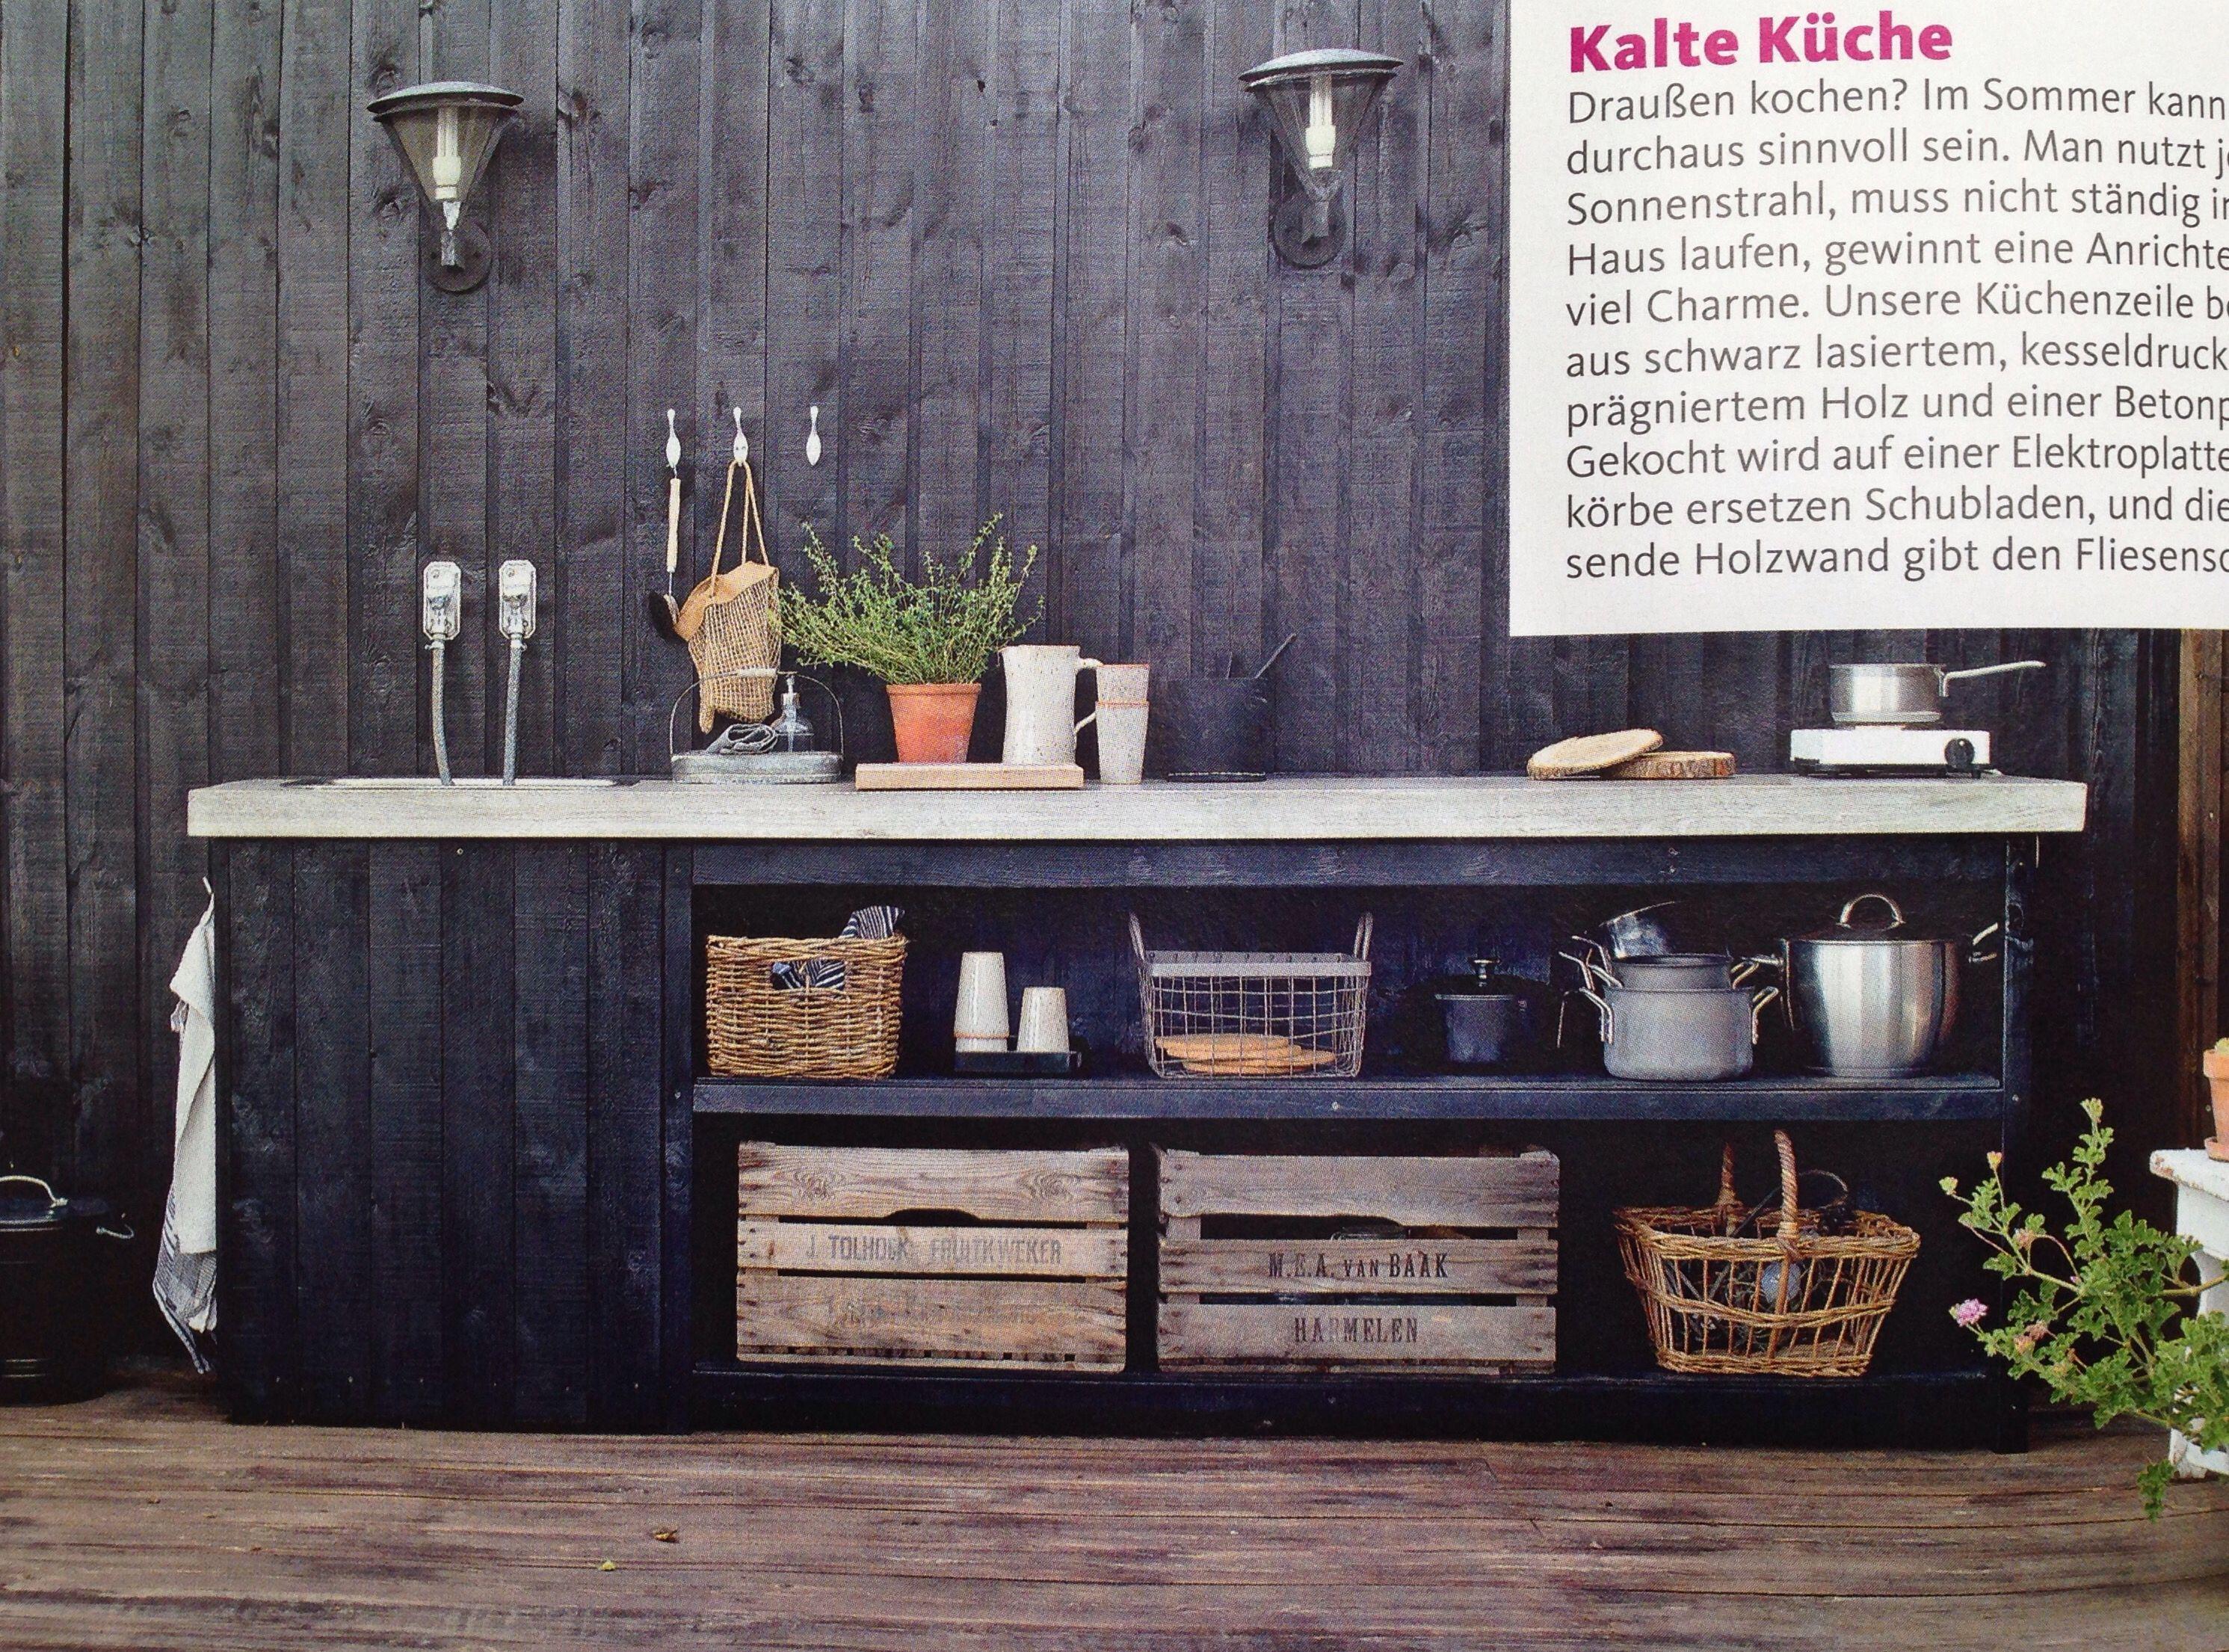 Anrichte Kche Holz Cool Ikea With Anrichte Kche Holz Selfmade Diy Kitchen Paletten Kche